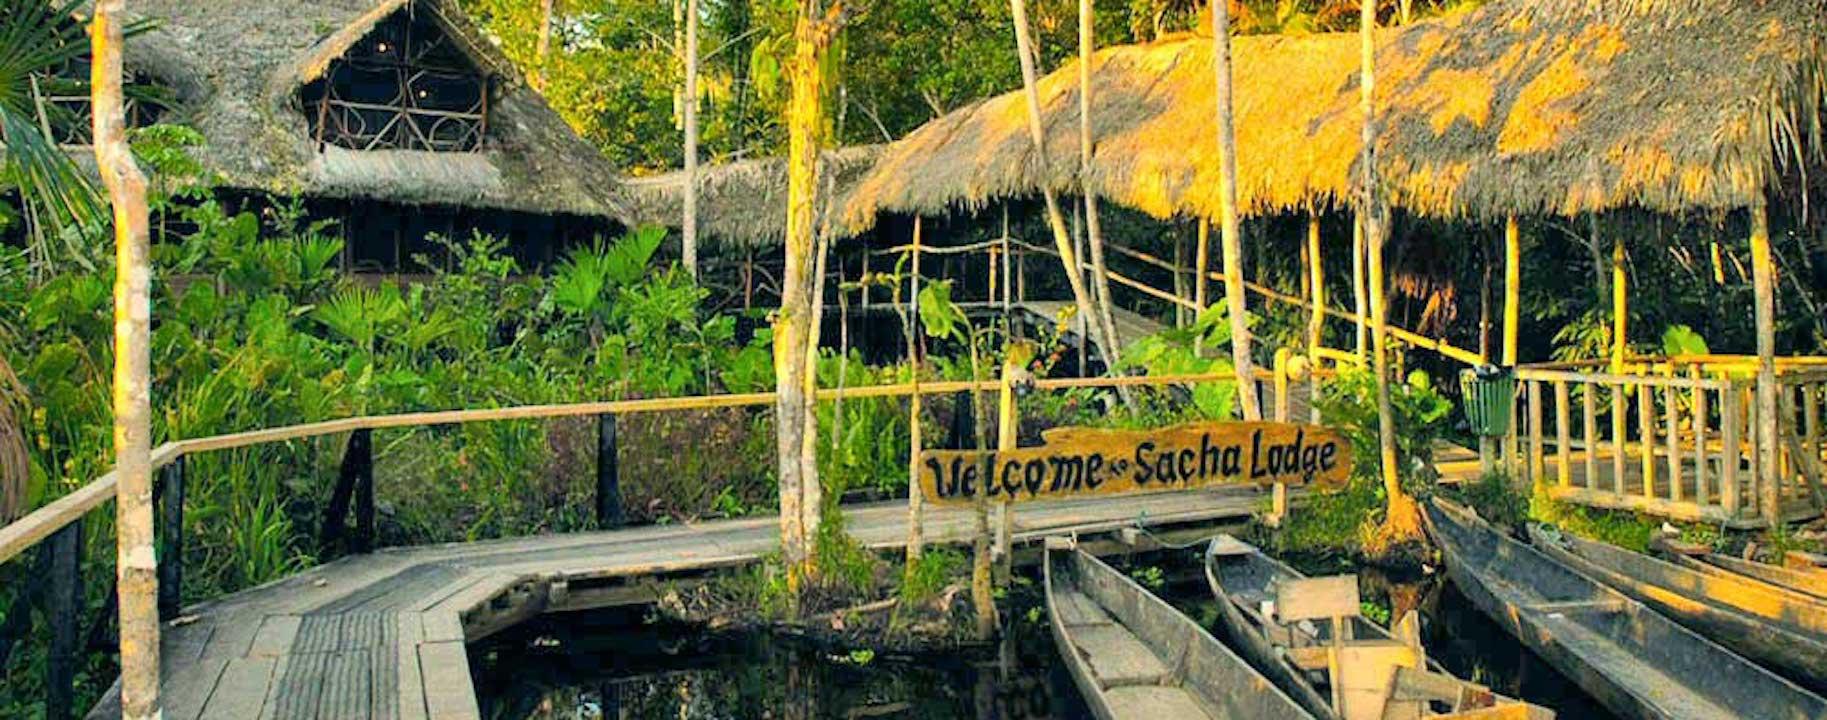 4D-3N Amazon Rainforest expedition / Plane , Boat , Hike / Ecuador Sacha Lodge